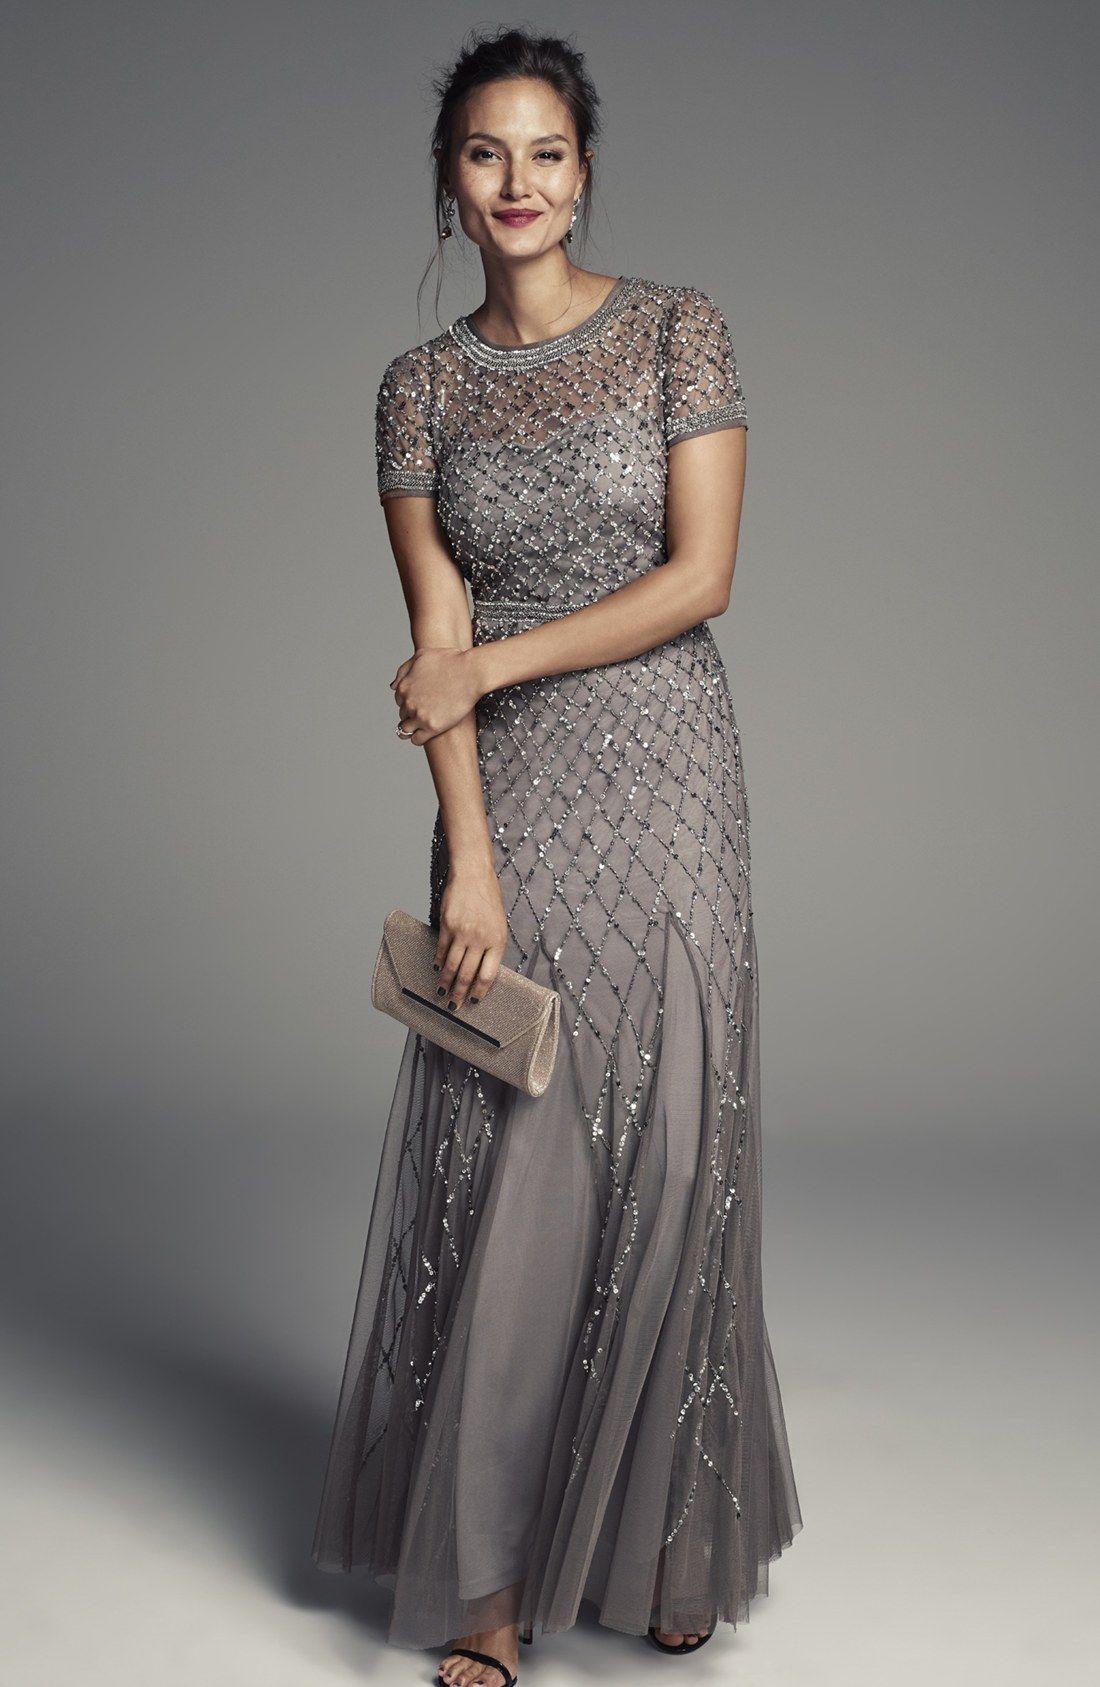 Diamond Mother of the Bride Dresses